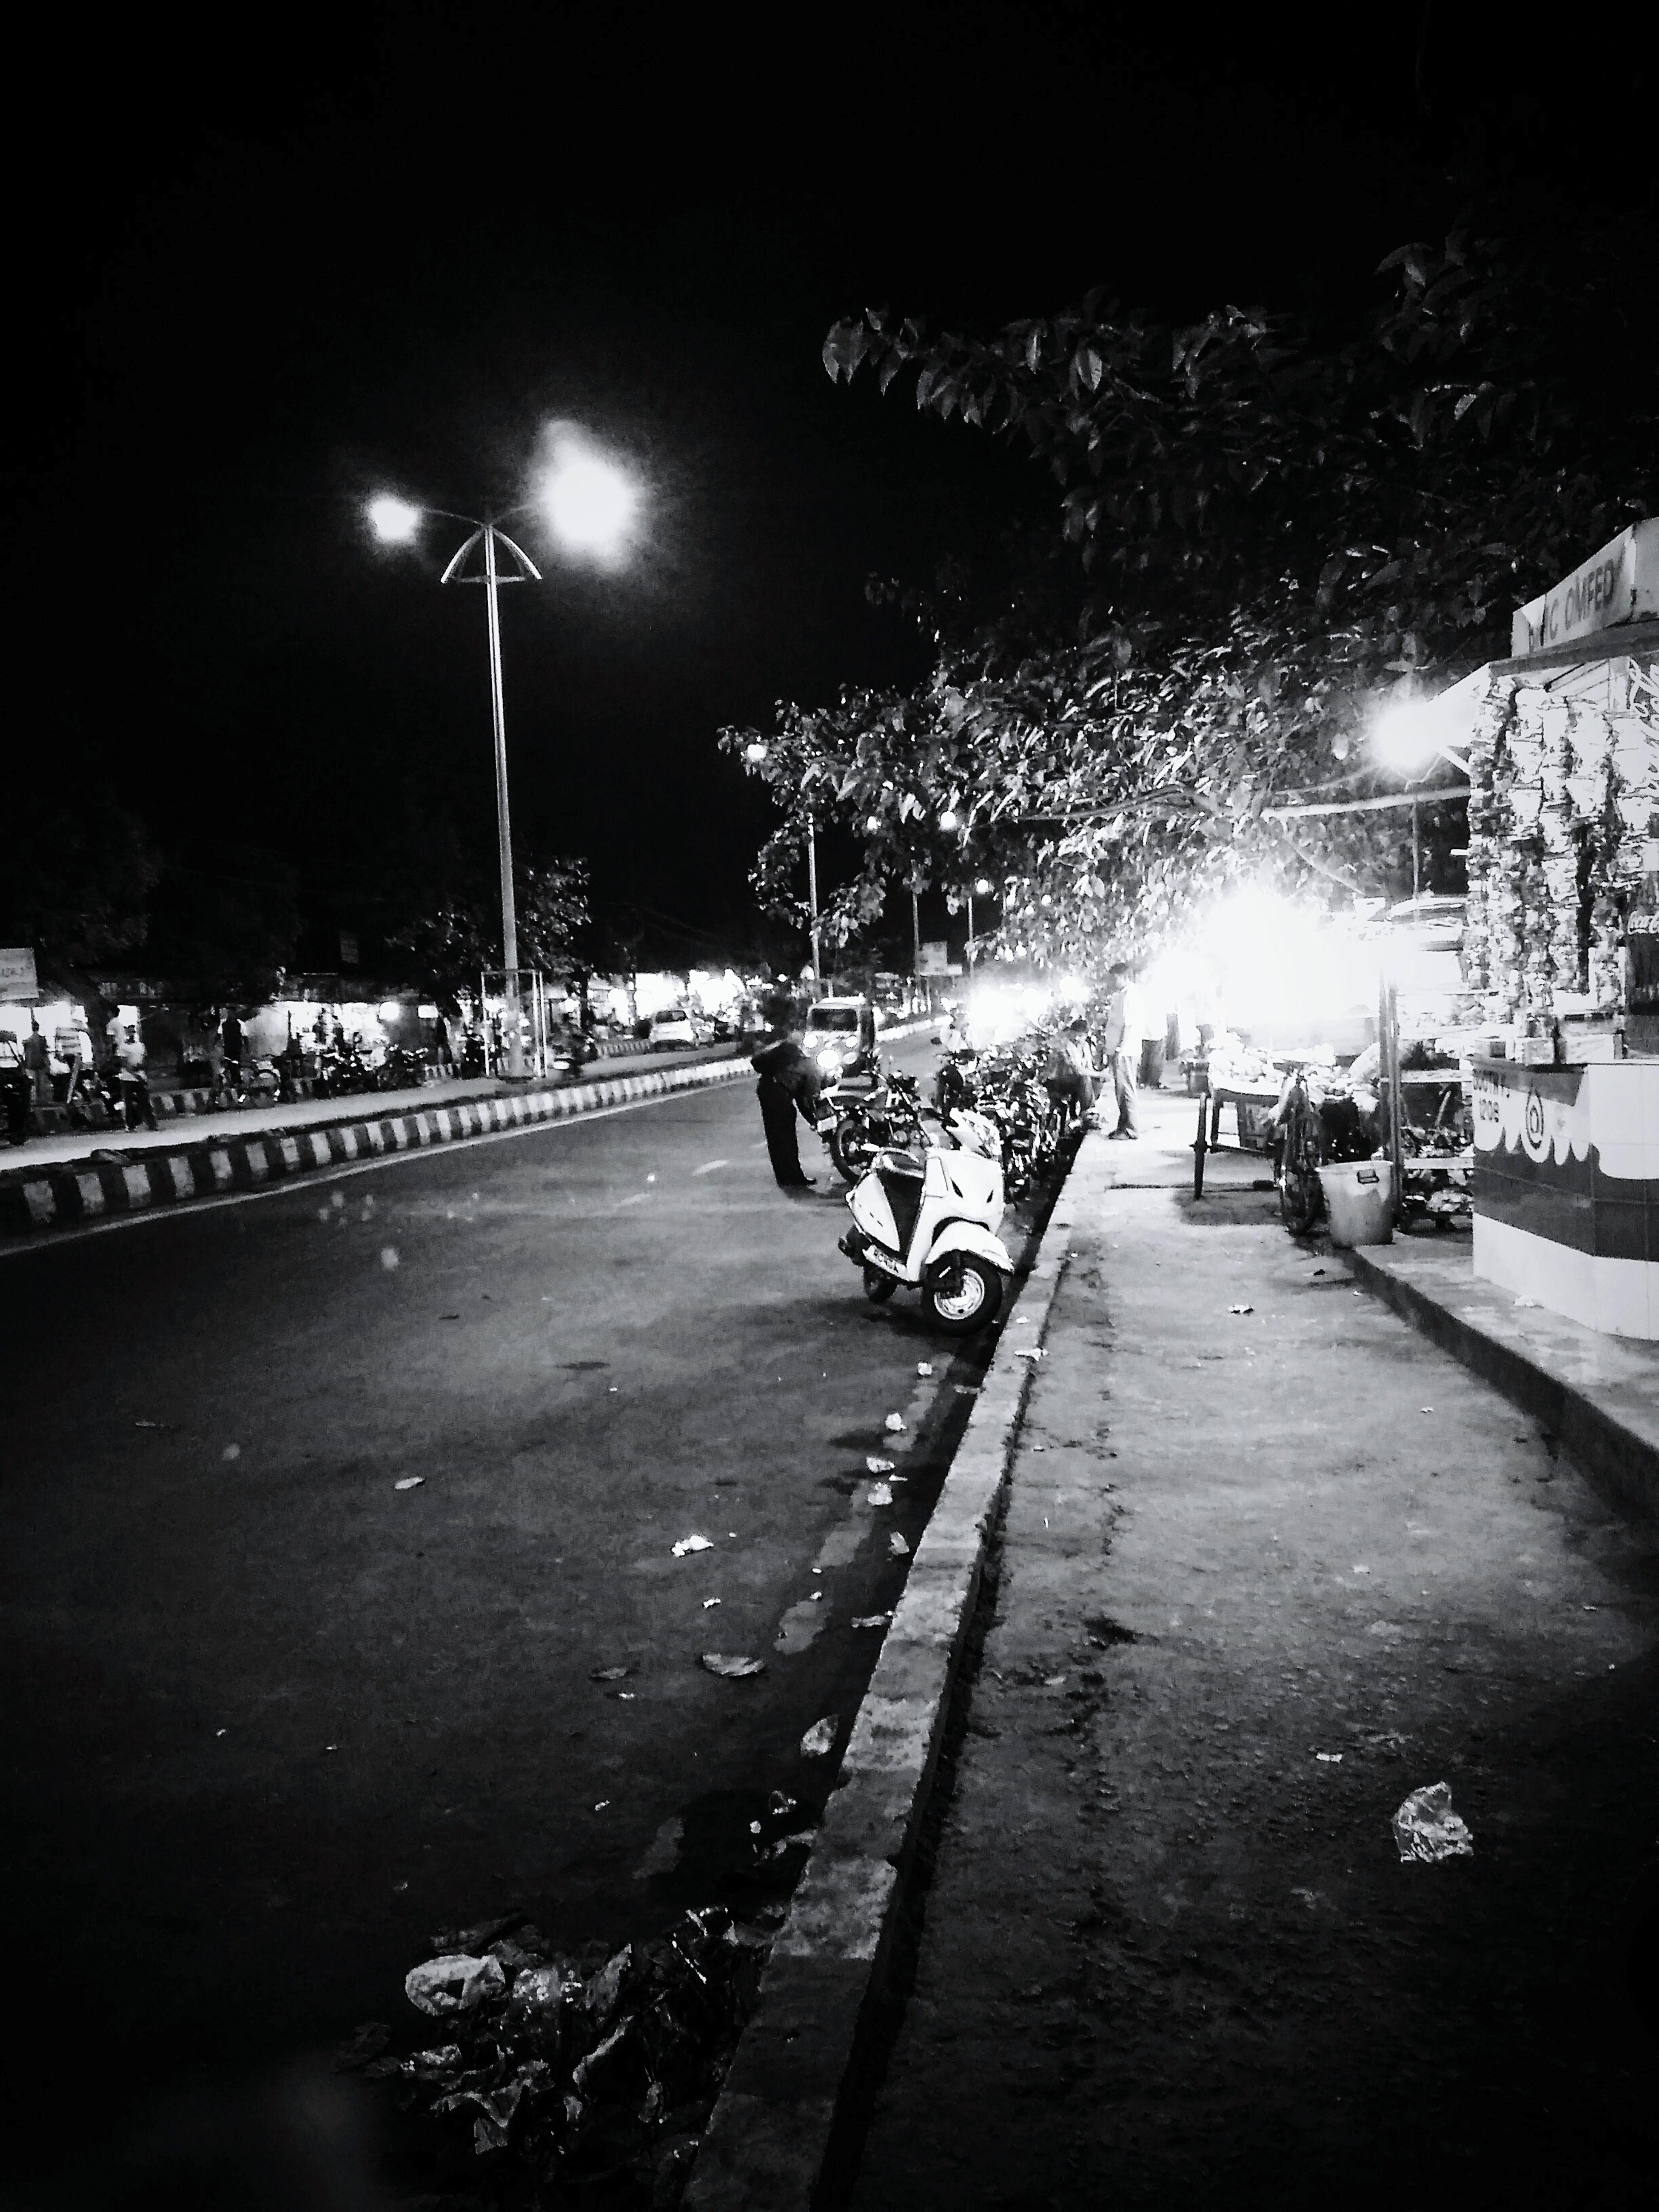 Nightphotography waiting